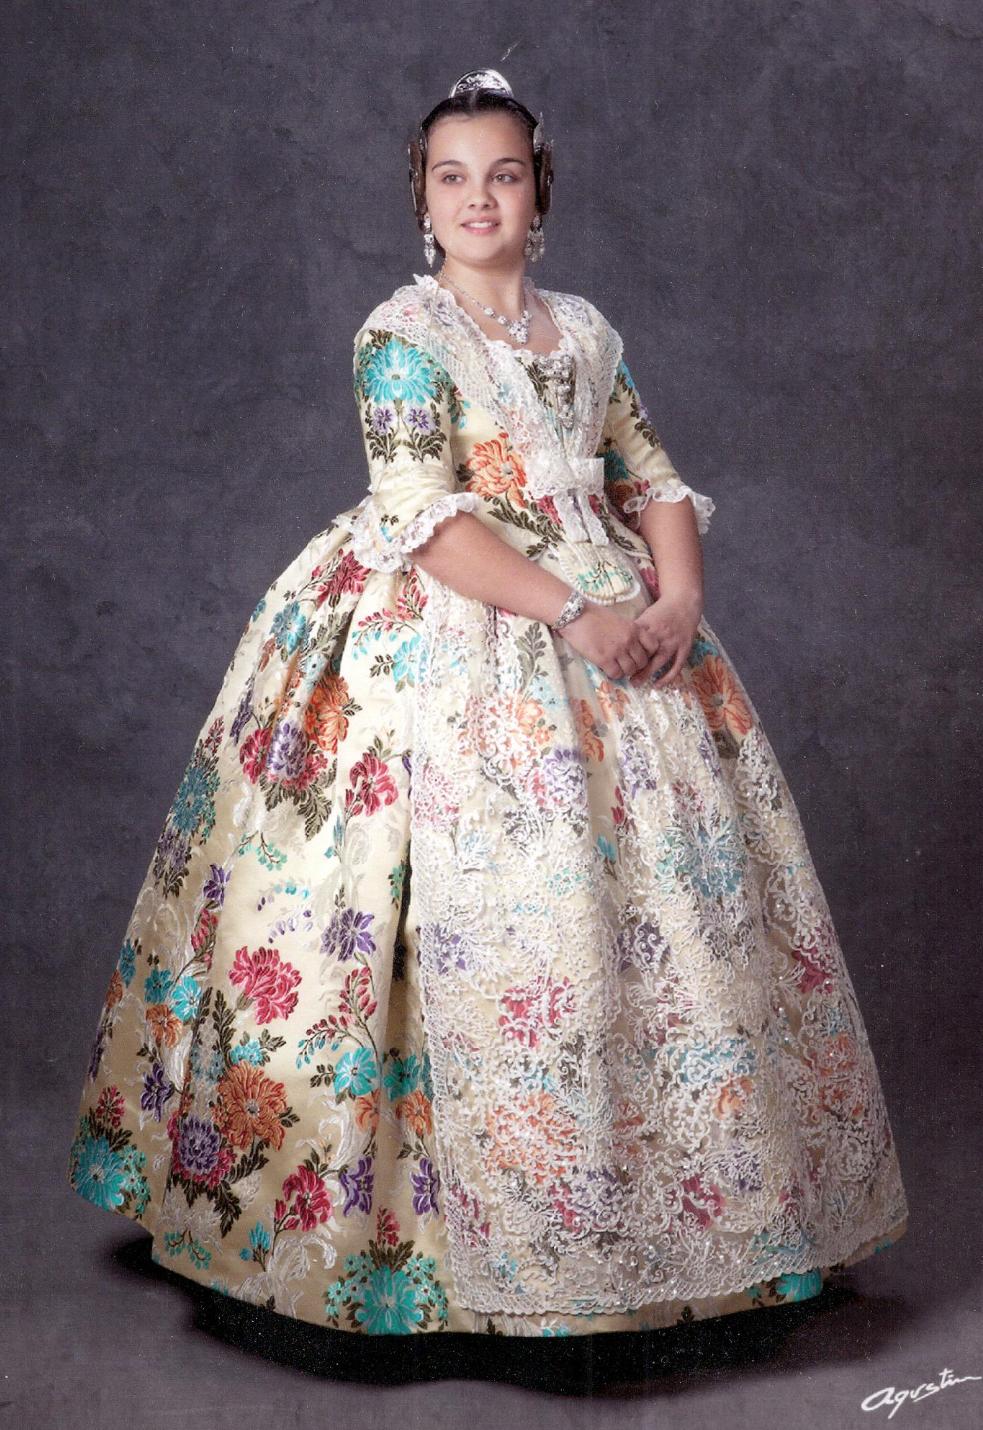 Olga Garcia Rosell